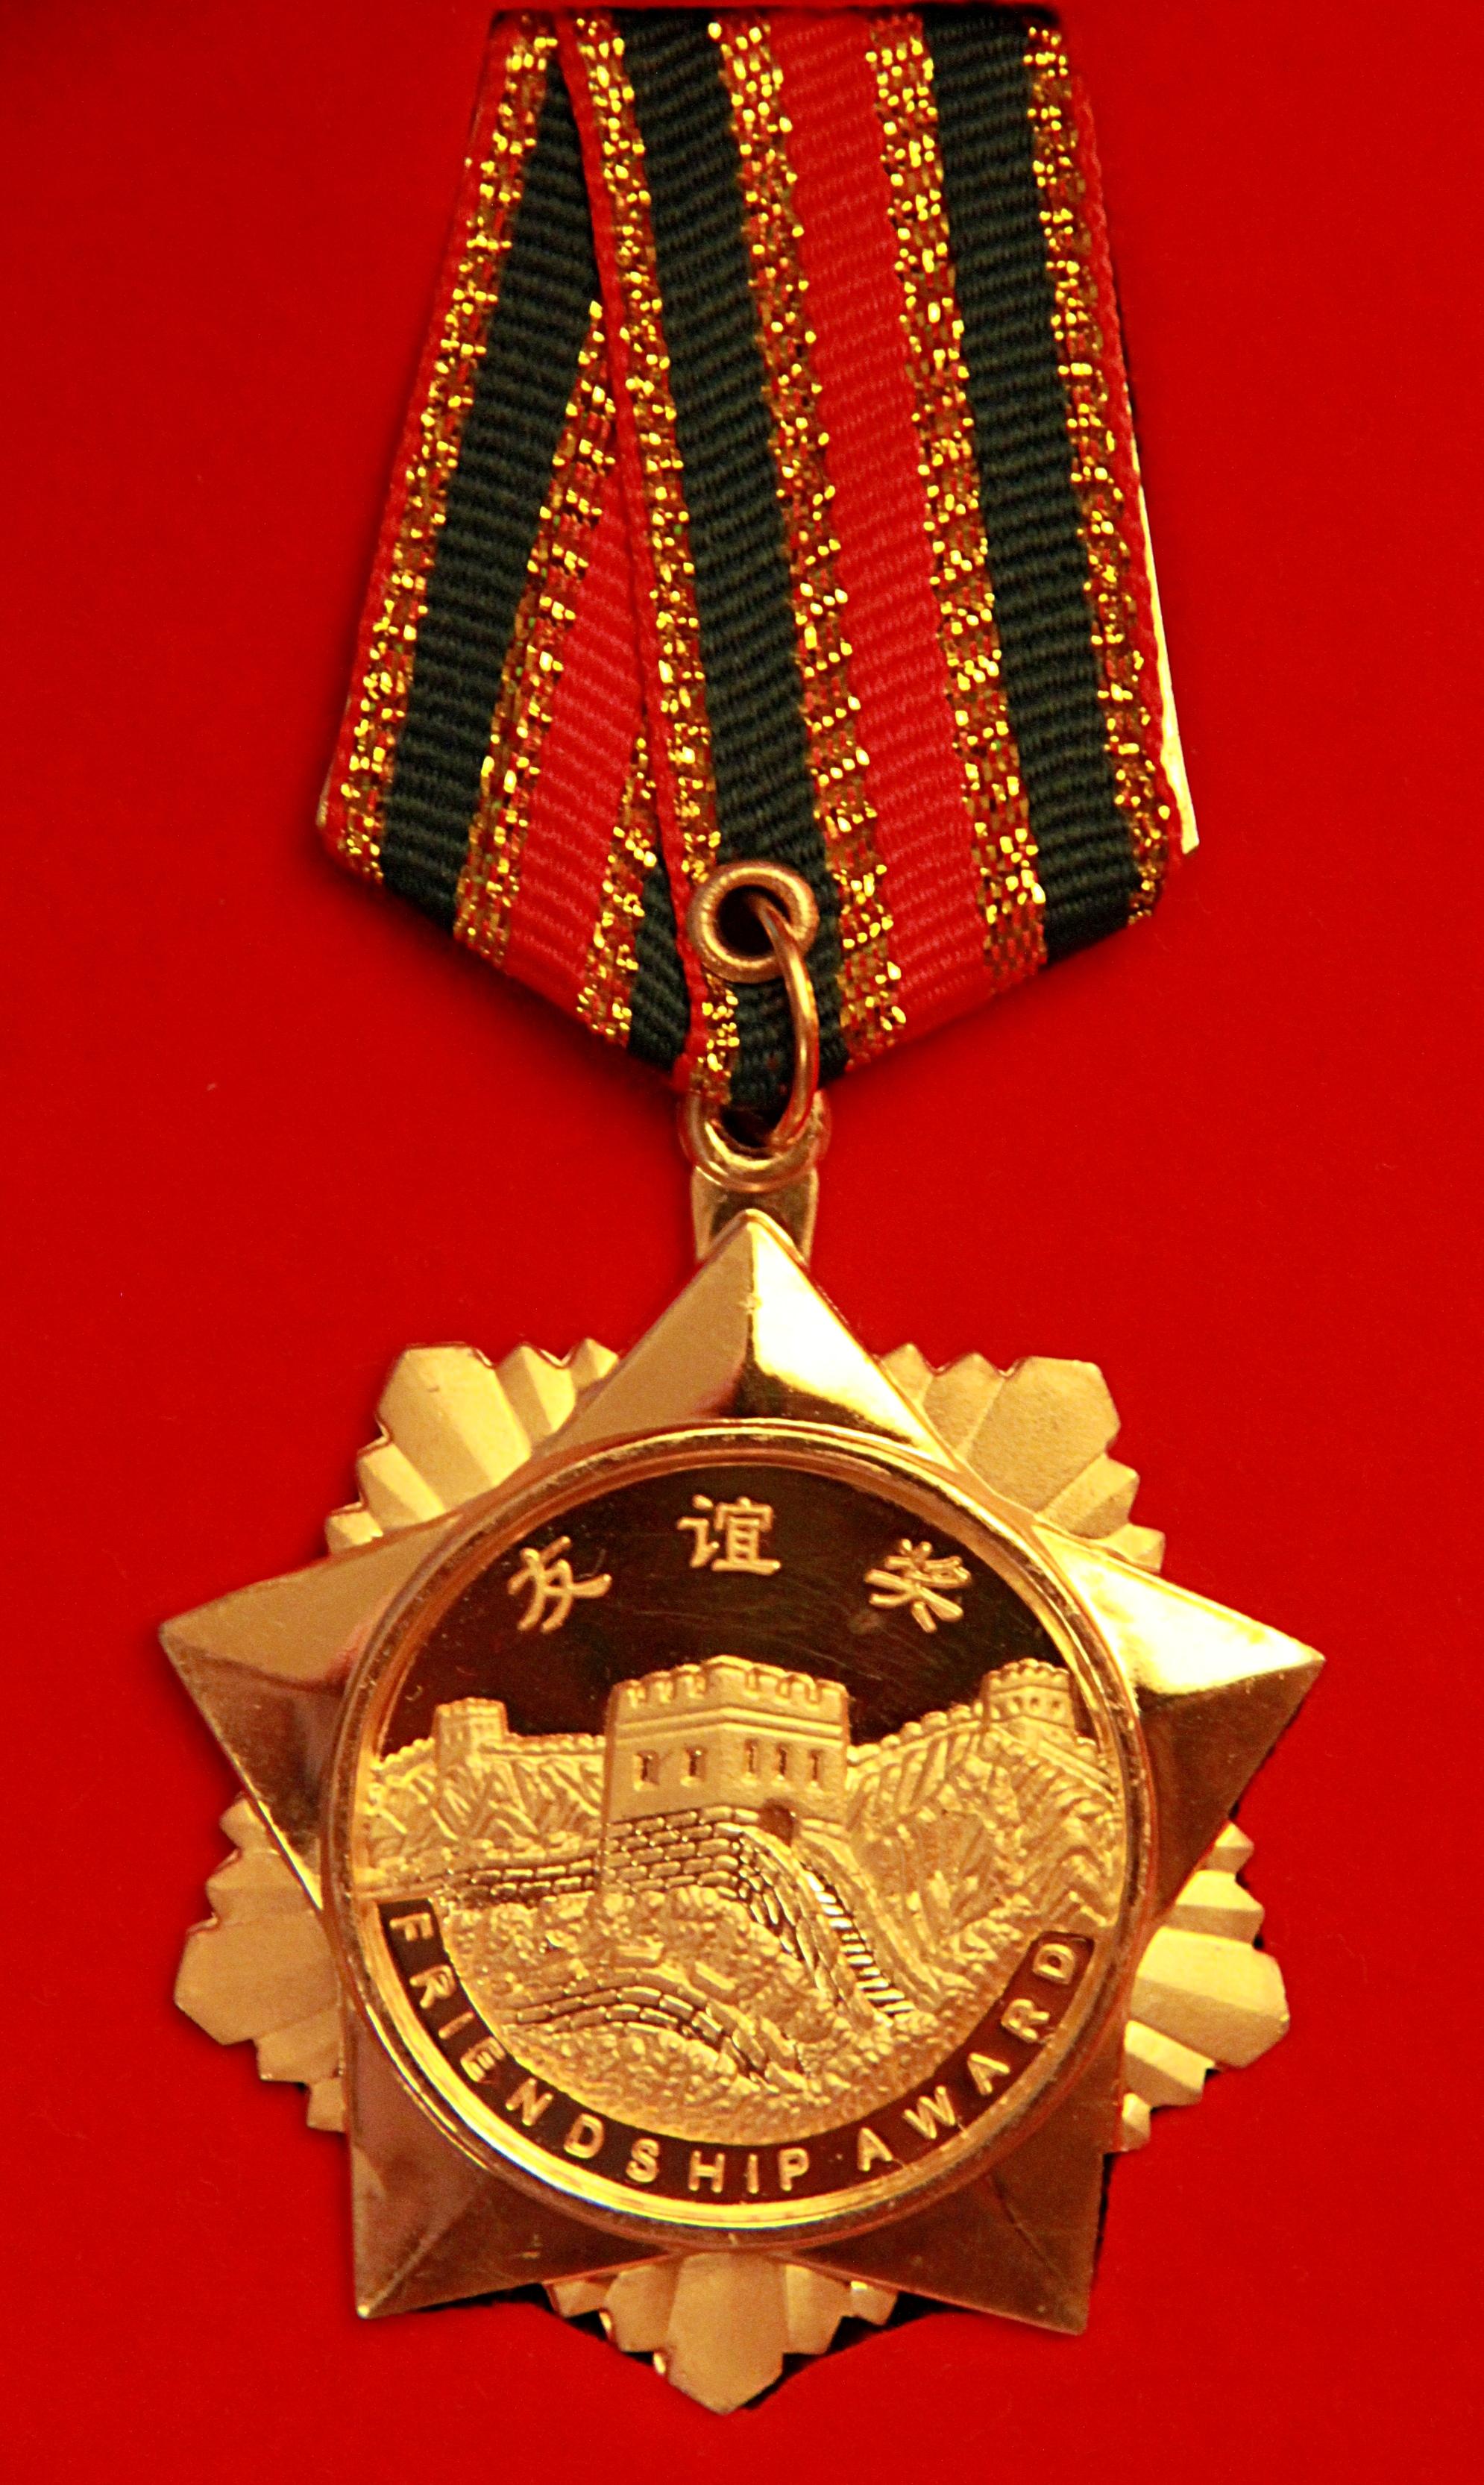 Friendshipaward_medal_2010.jpg